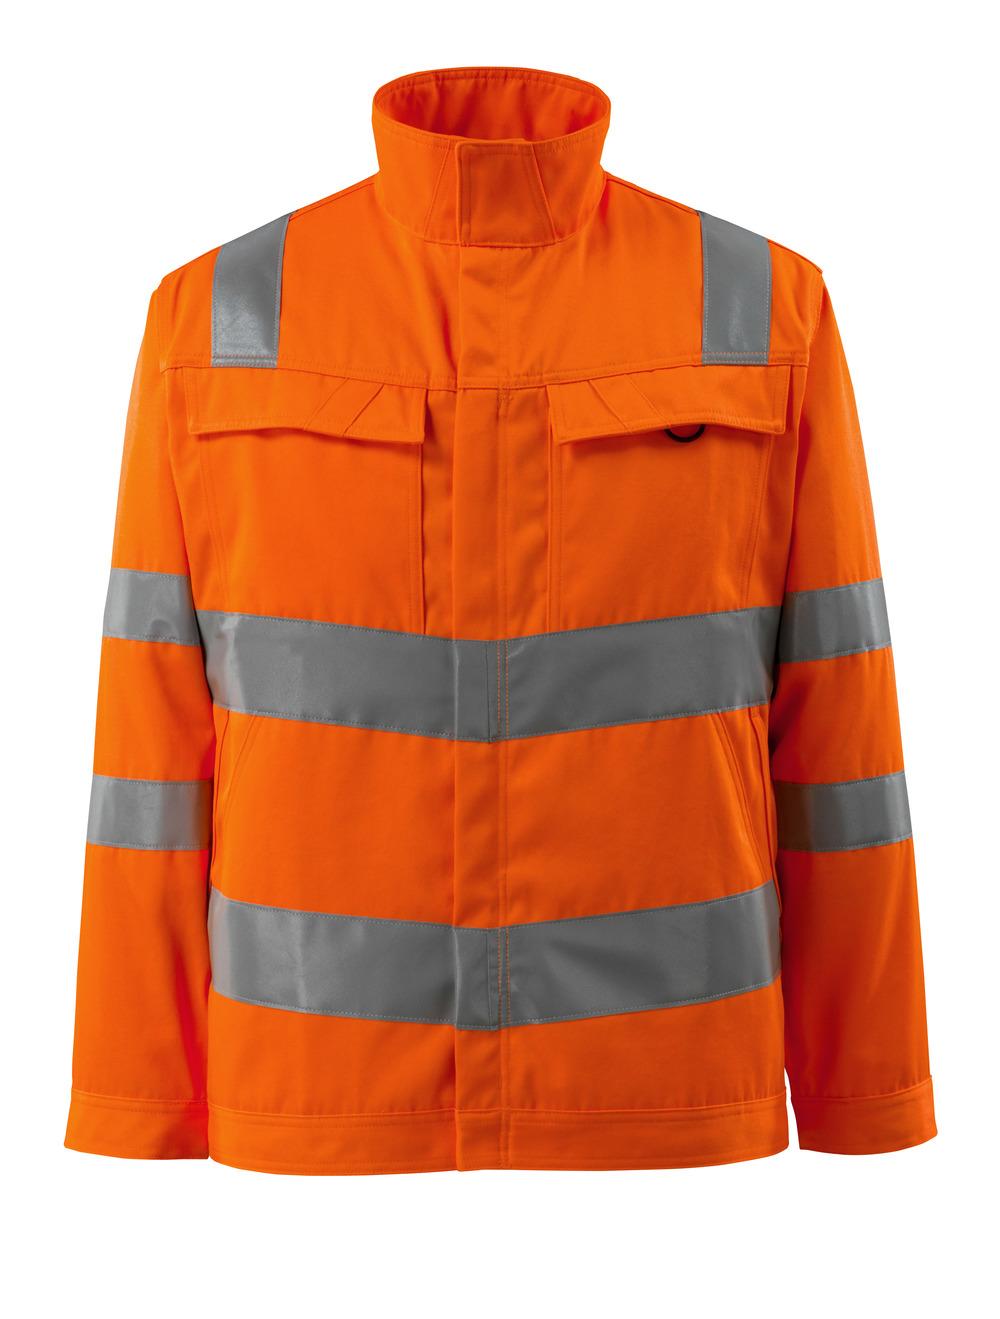 16909-860-14 Jack - hi-vis oranje